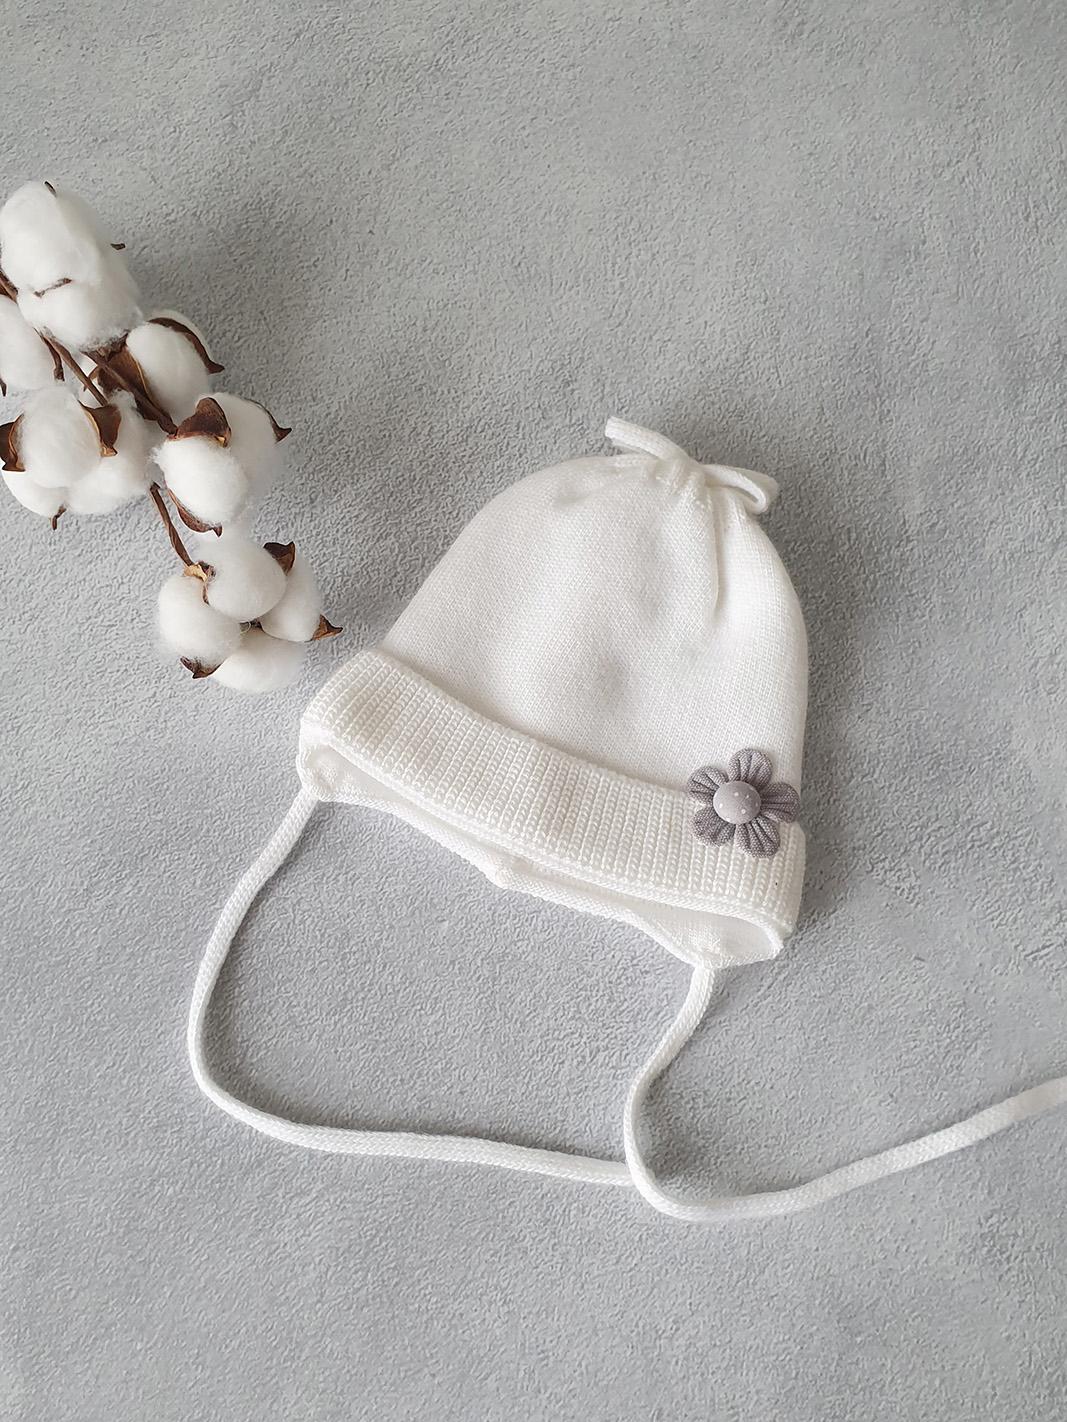 Демисезонная шапка «Цветок» (белая) 0-4 мес